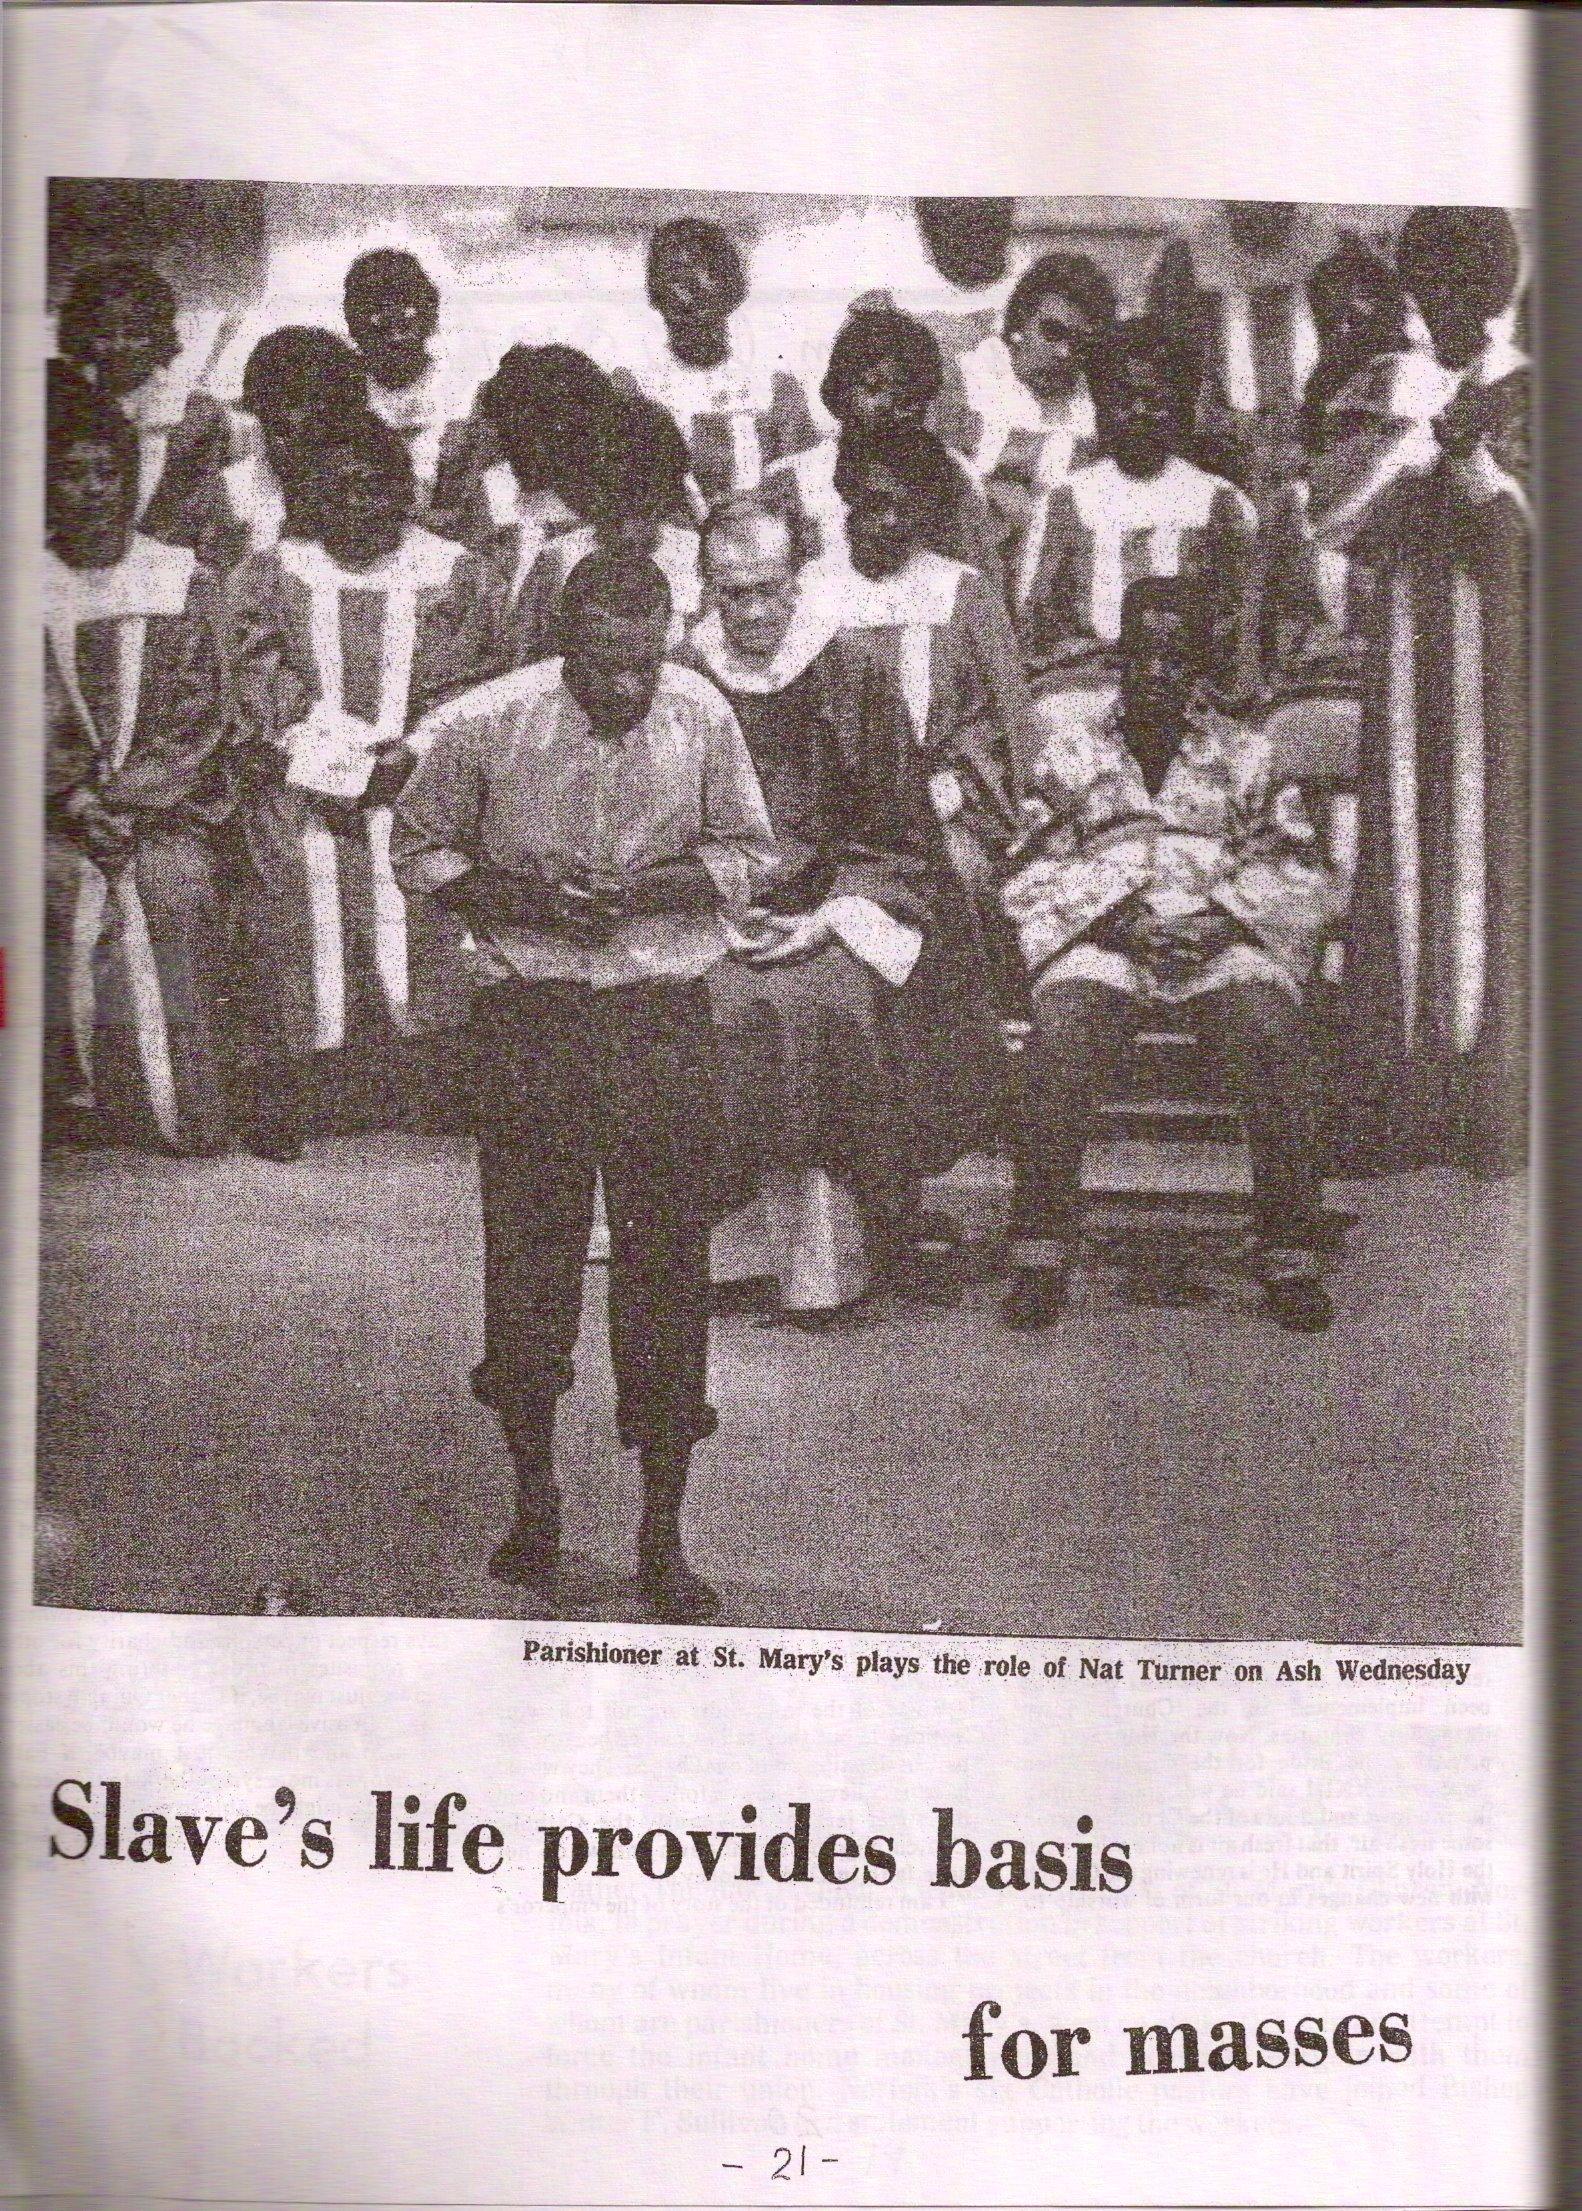 Nat Turner liturgy celebration in Courtland, Virginia